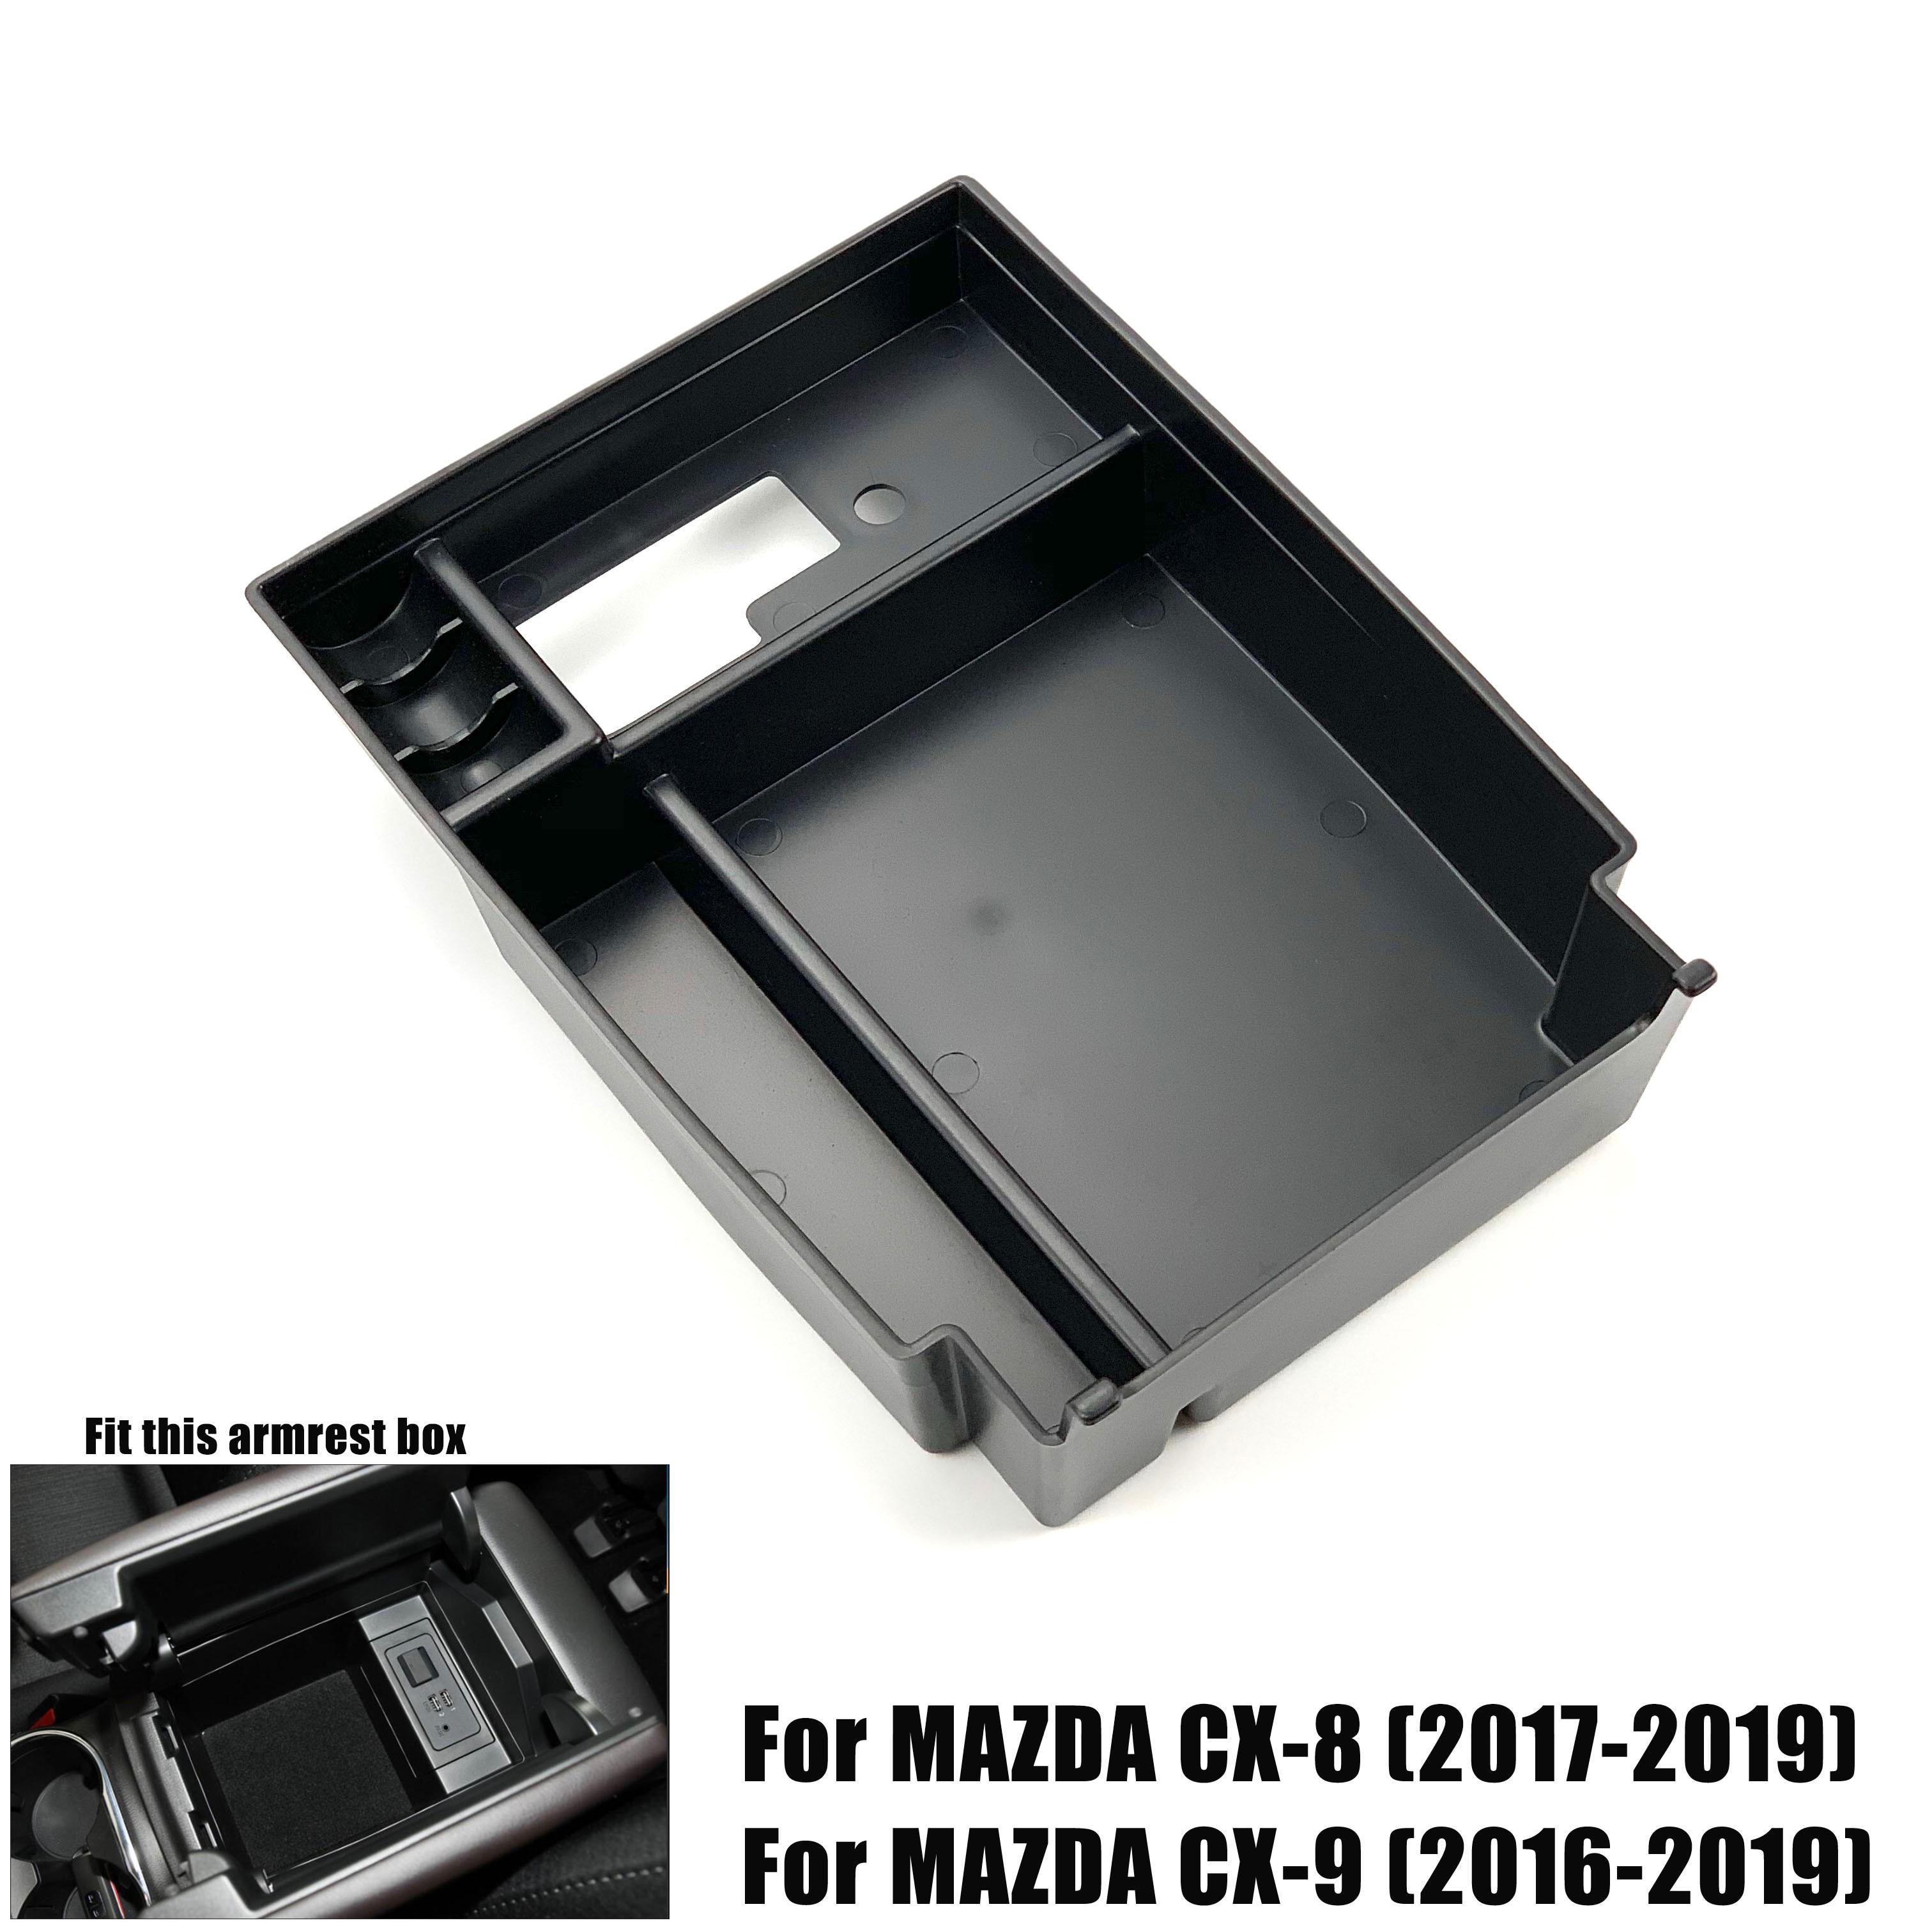 Black Car Armrest Storage Box Car Central Interior Tray for Mazda CX-5 2017-2019